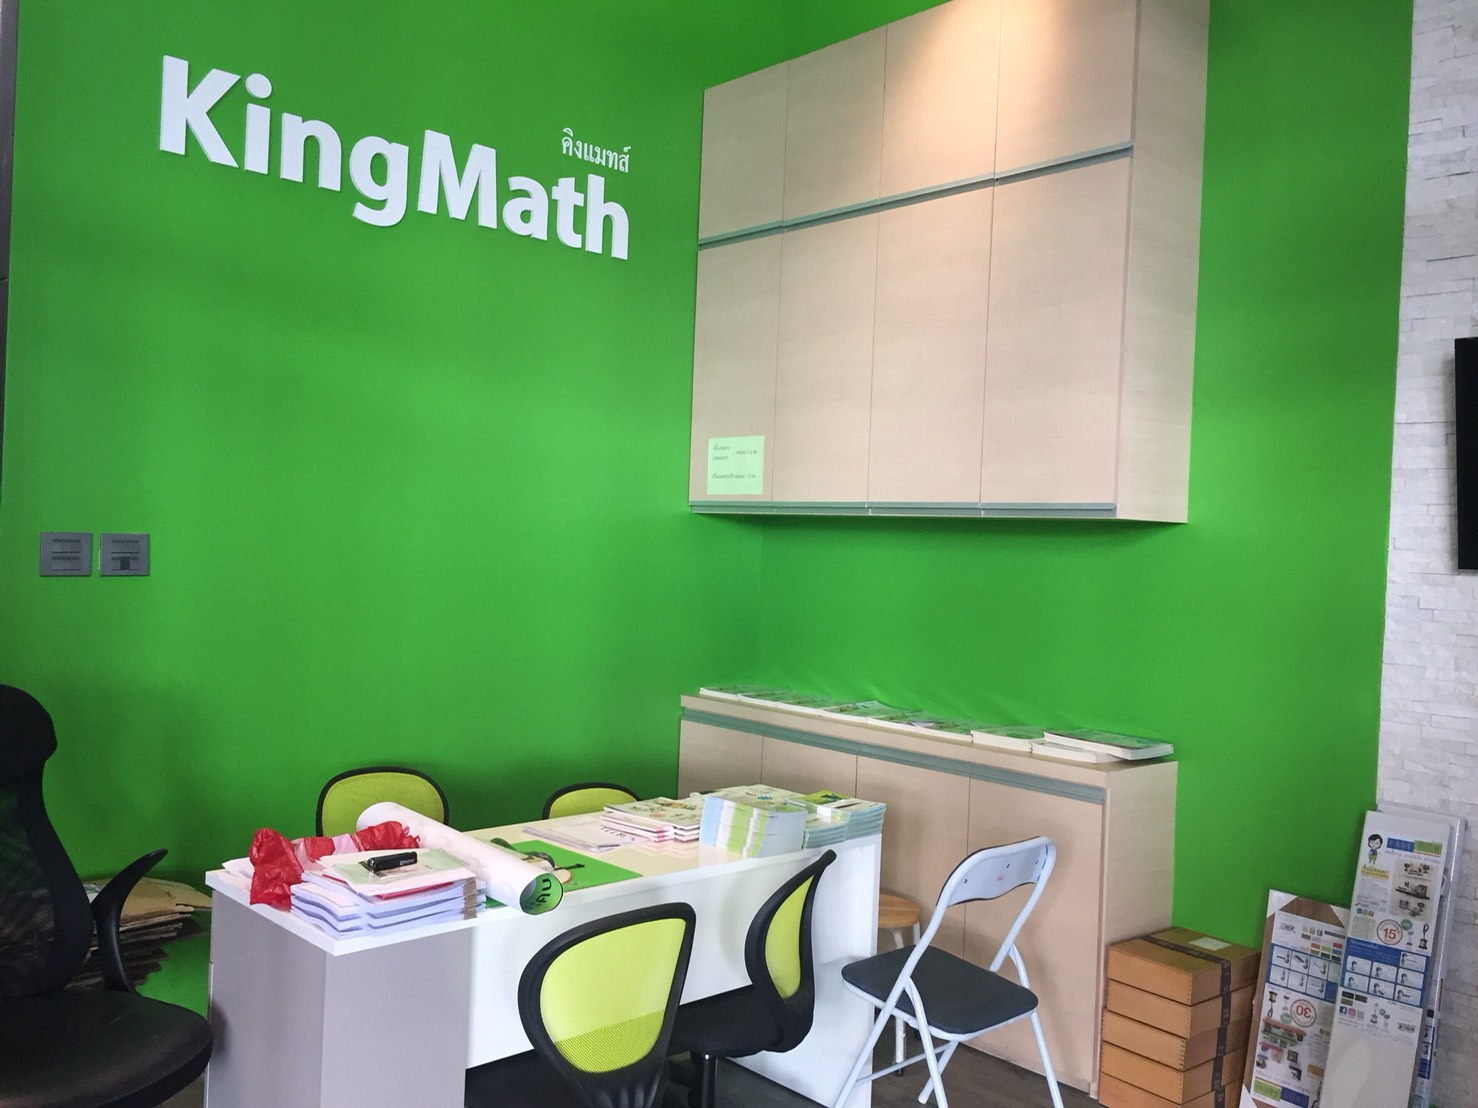 KingClass Academy สาขาโรบินสันสมุทรปราการ  เปิดสถาบันอย่างเป็นทางการ